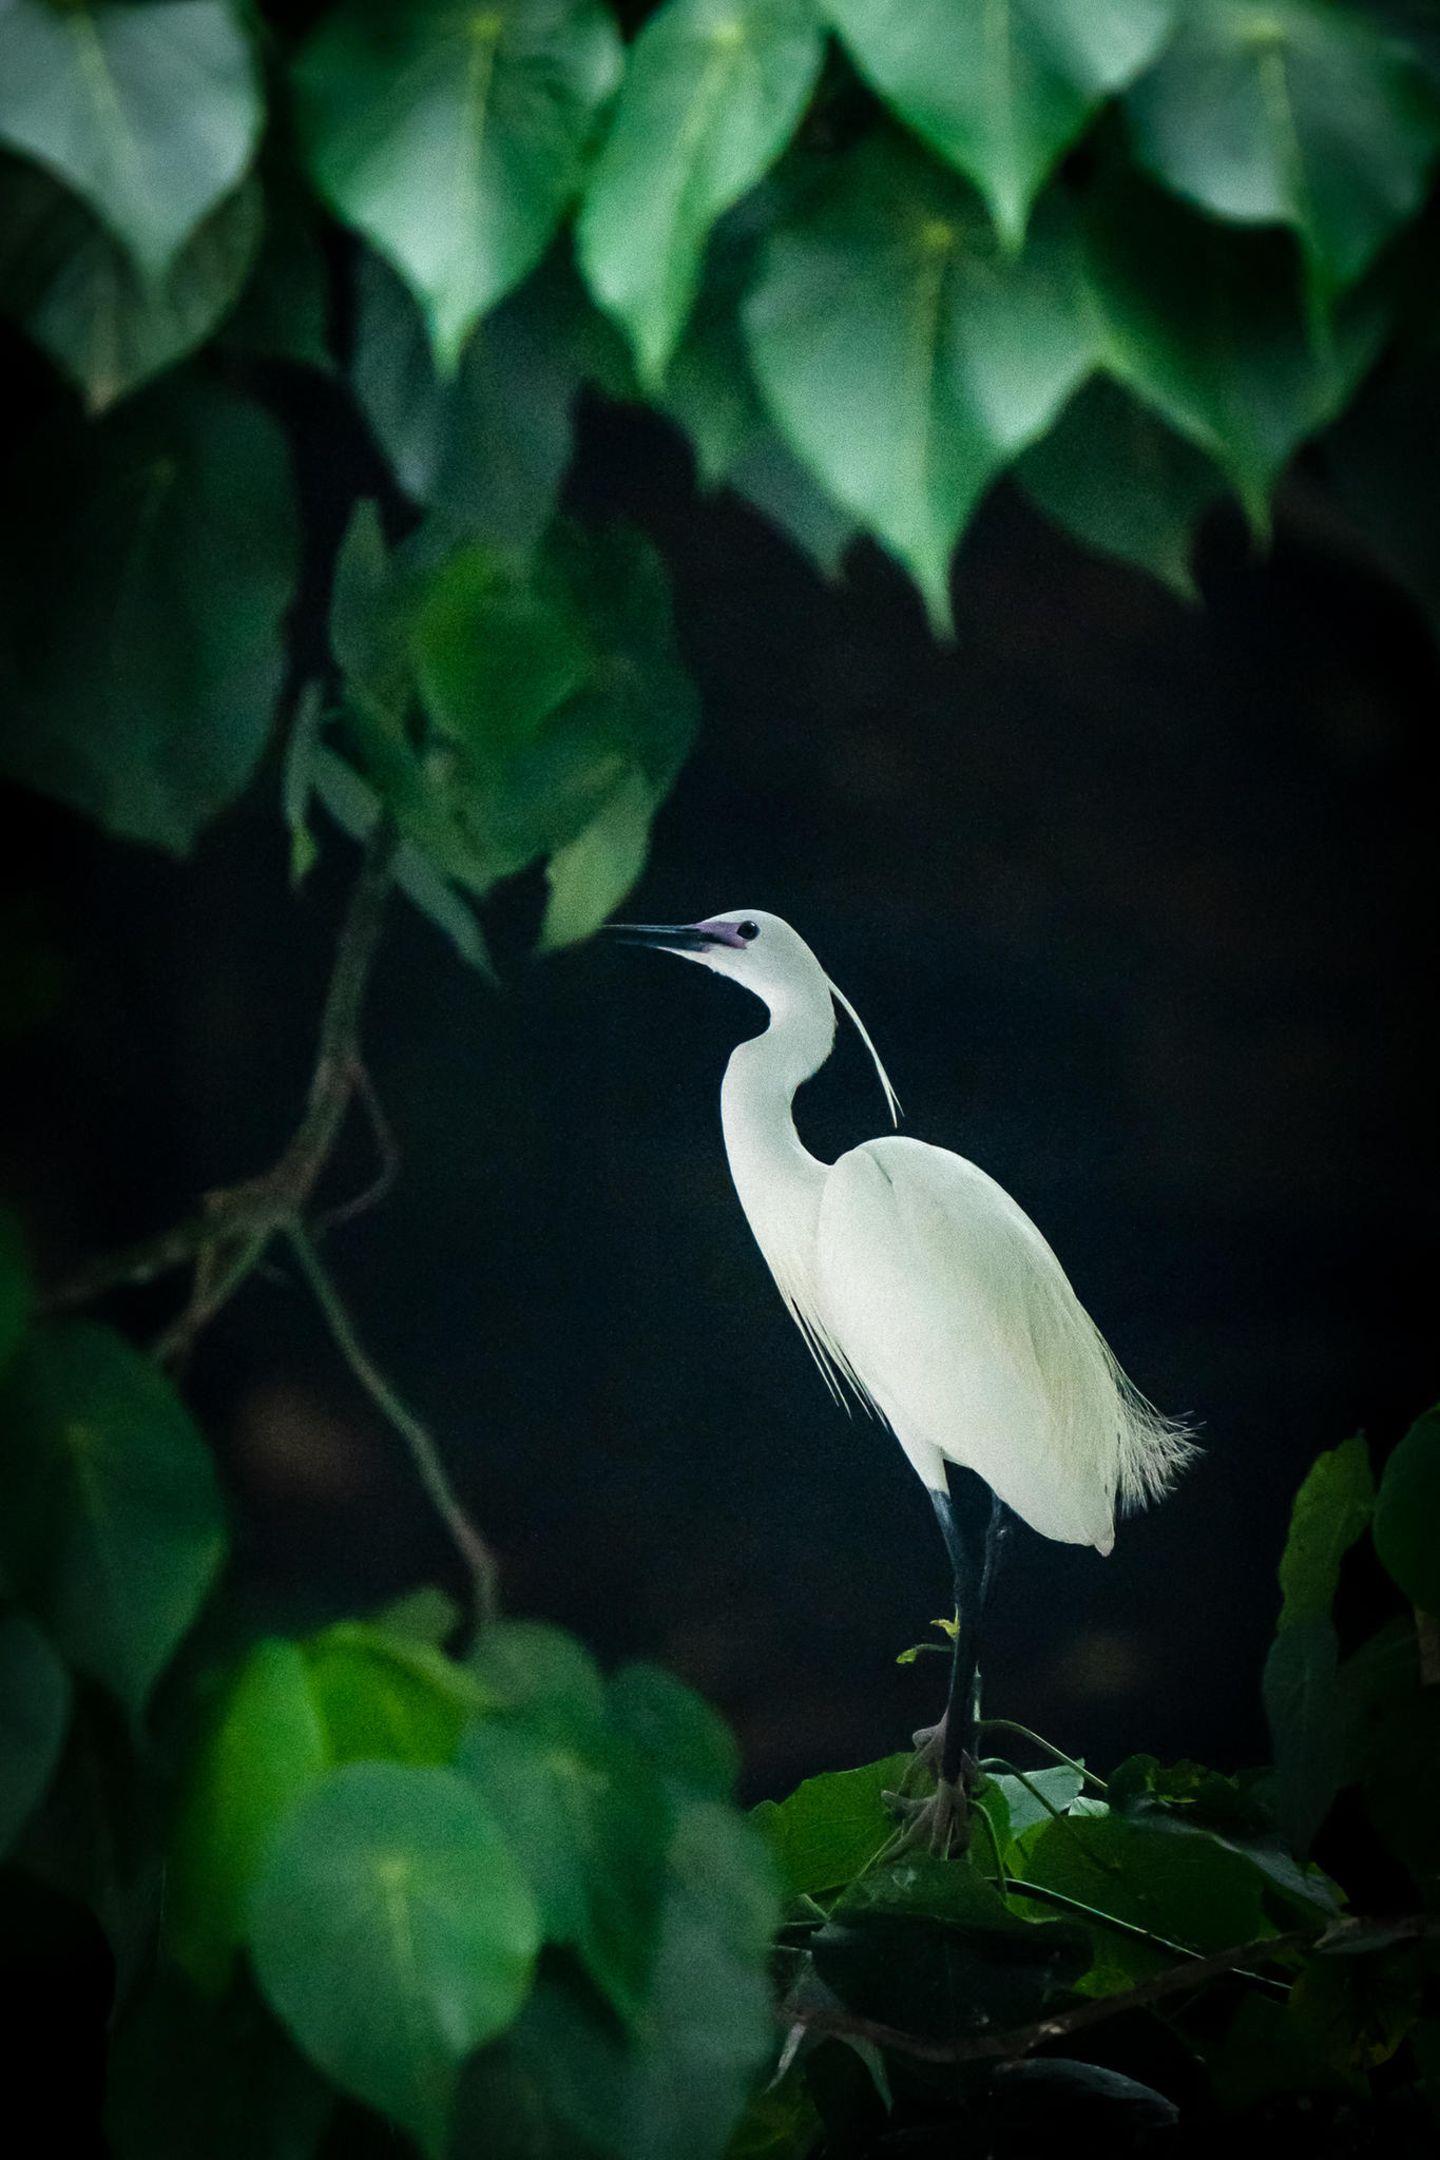 Au Hin Man, Hong Kong, Shortlist, Open, Natural World & Wildlife, 2021 Sony World Photography Awards